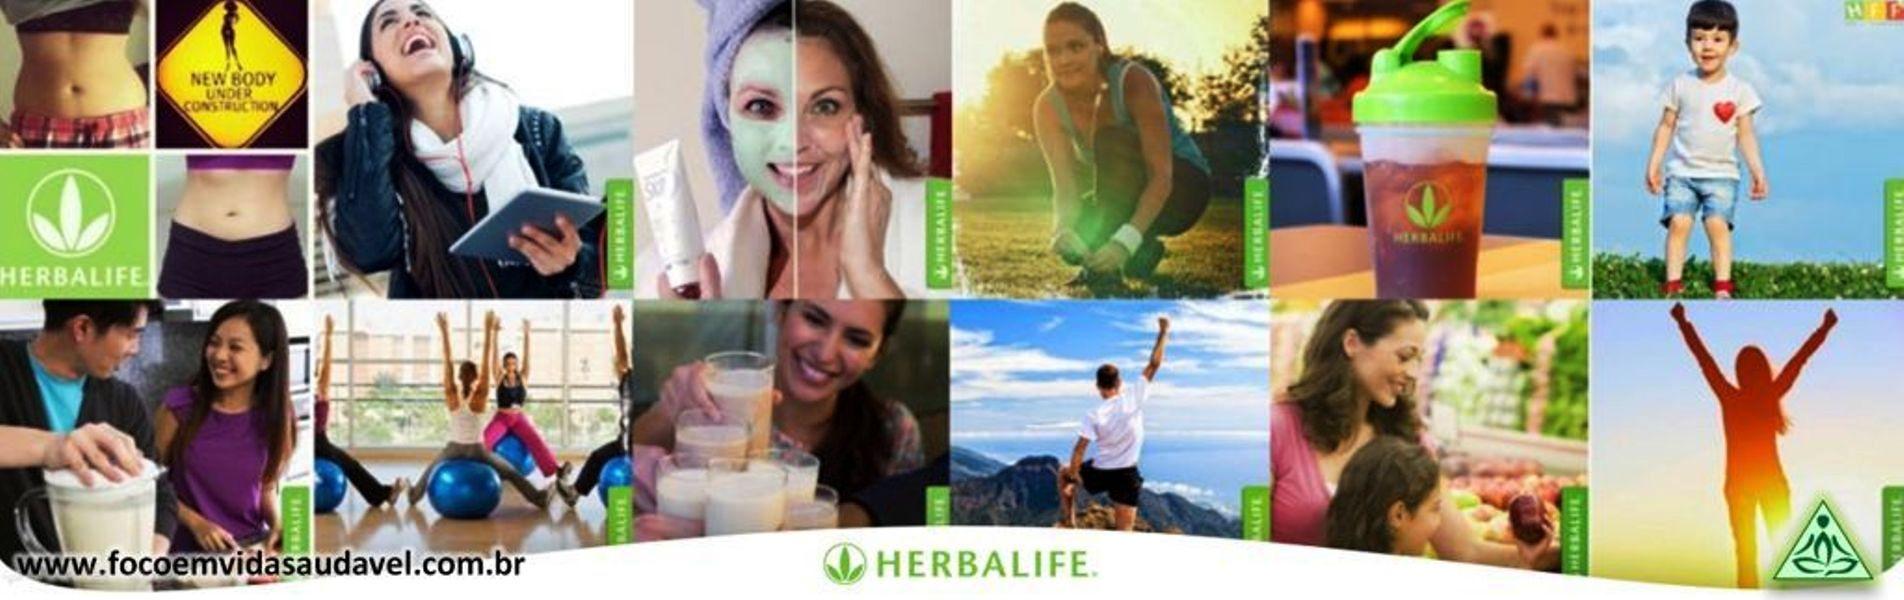 consultora-herbalife-foco-em-vida-ativa-e-saudavel-10